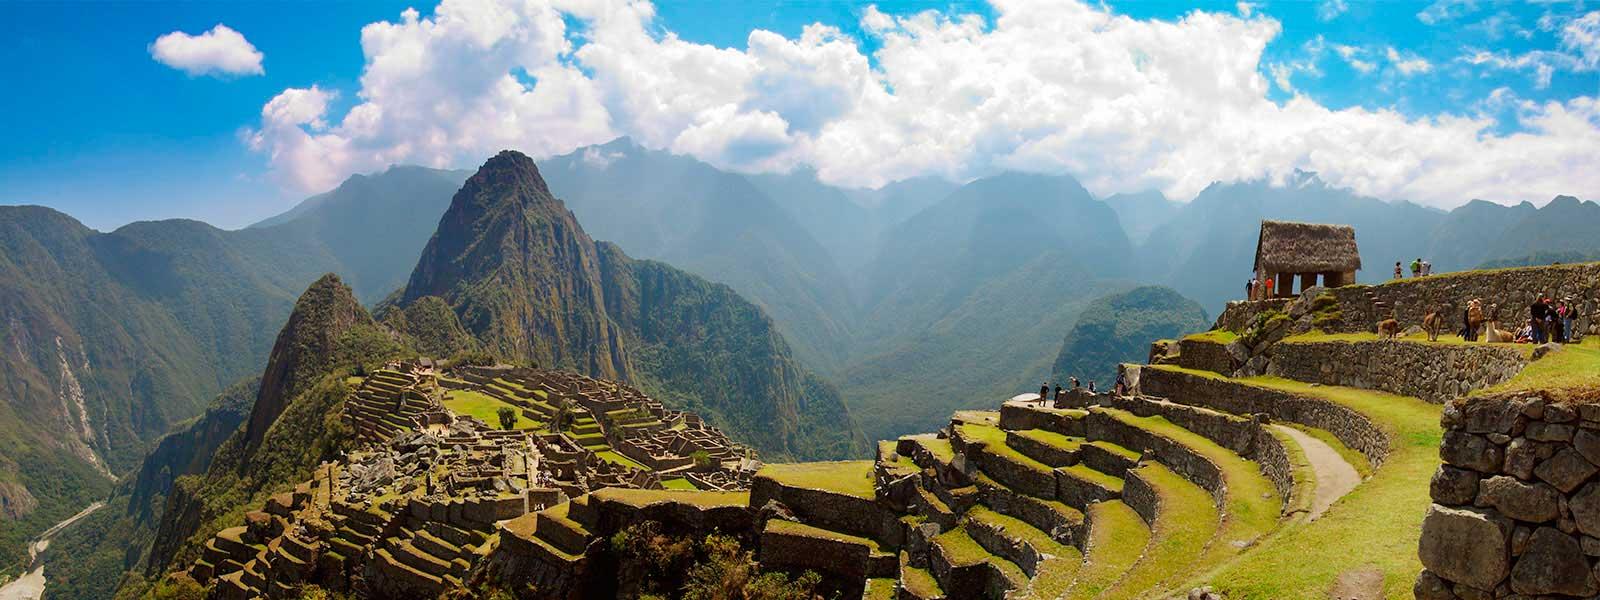 Machu Picchu amazing landscape